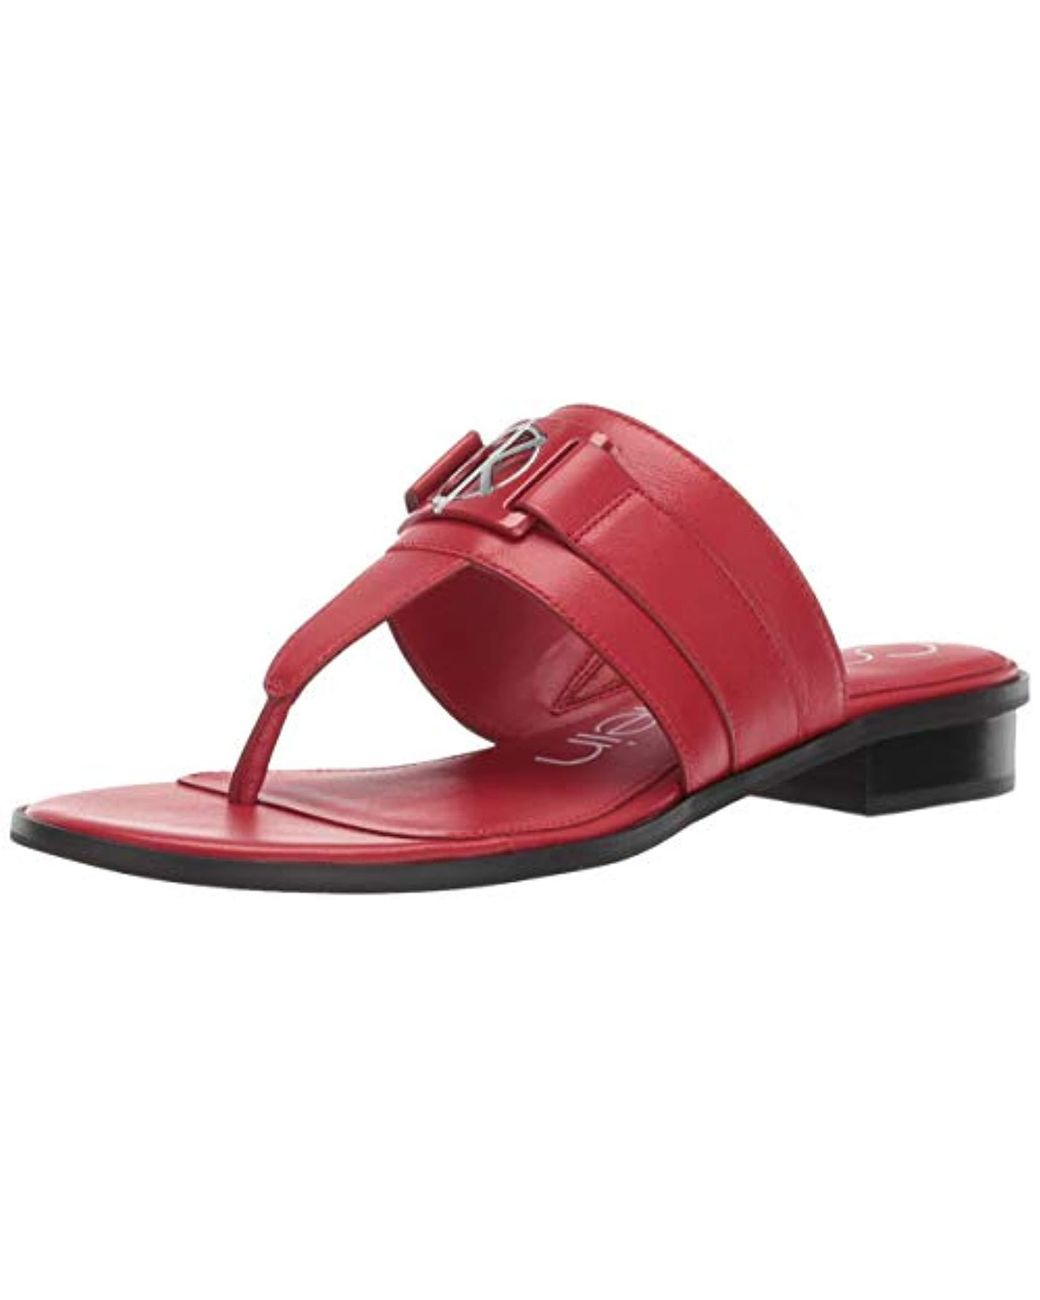 175e4f3e8fda Lyst - Calvin Klein Farley Flat Sandal in Red